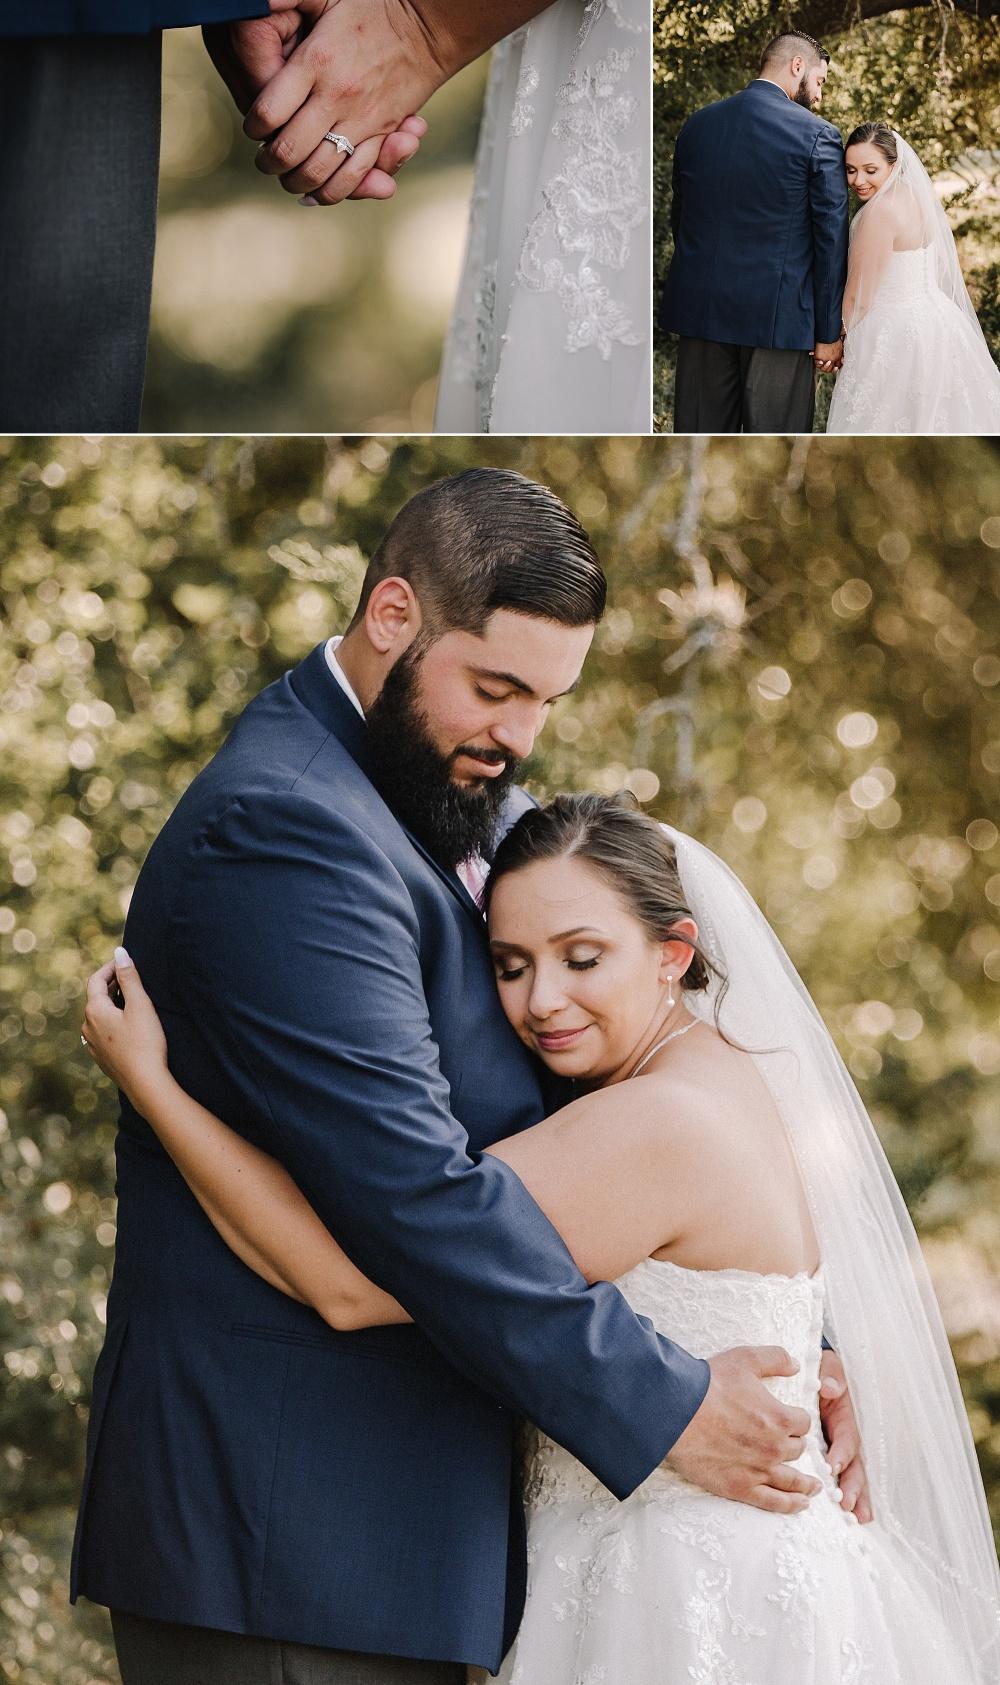 Wedding-Photographer-Bulverde-Texas-Western-Sky-Event-Venue-Carly-Barton-Photography_0050.jpg